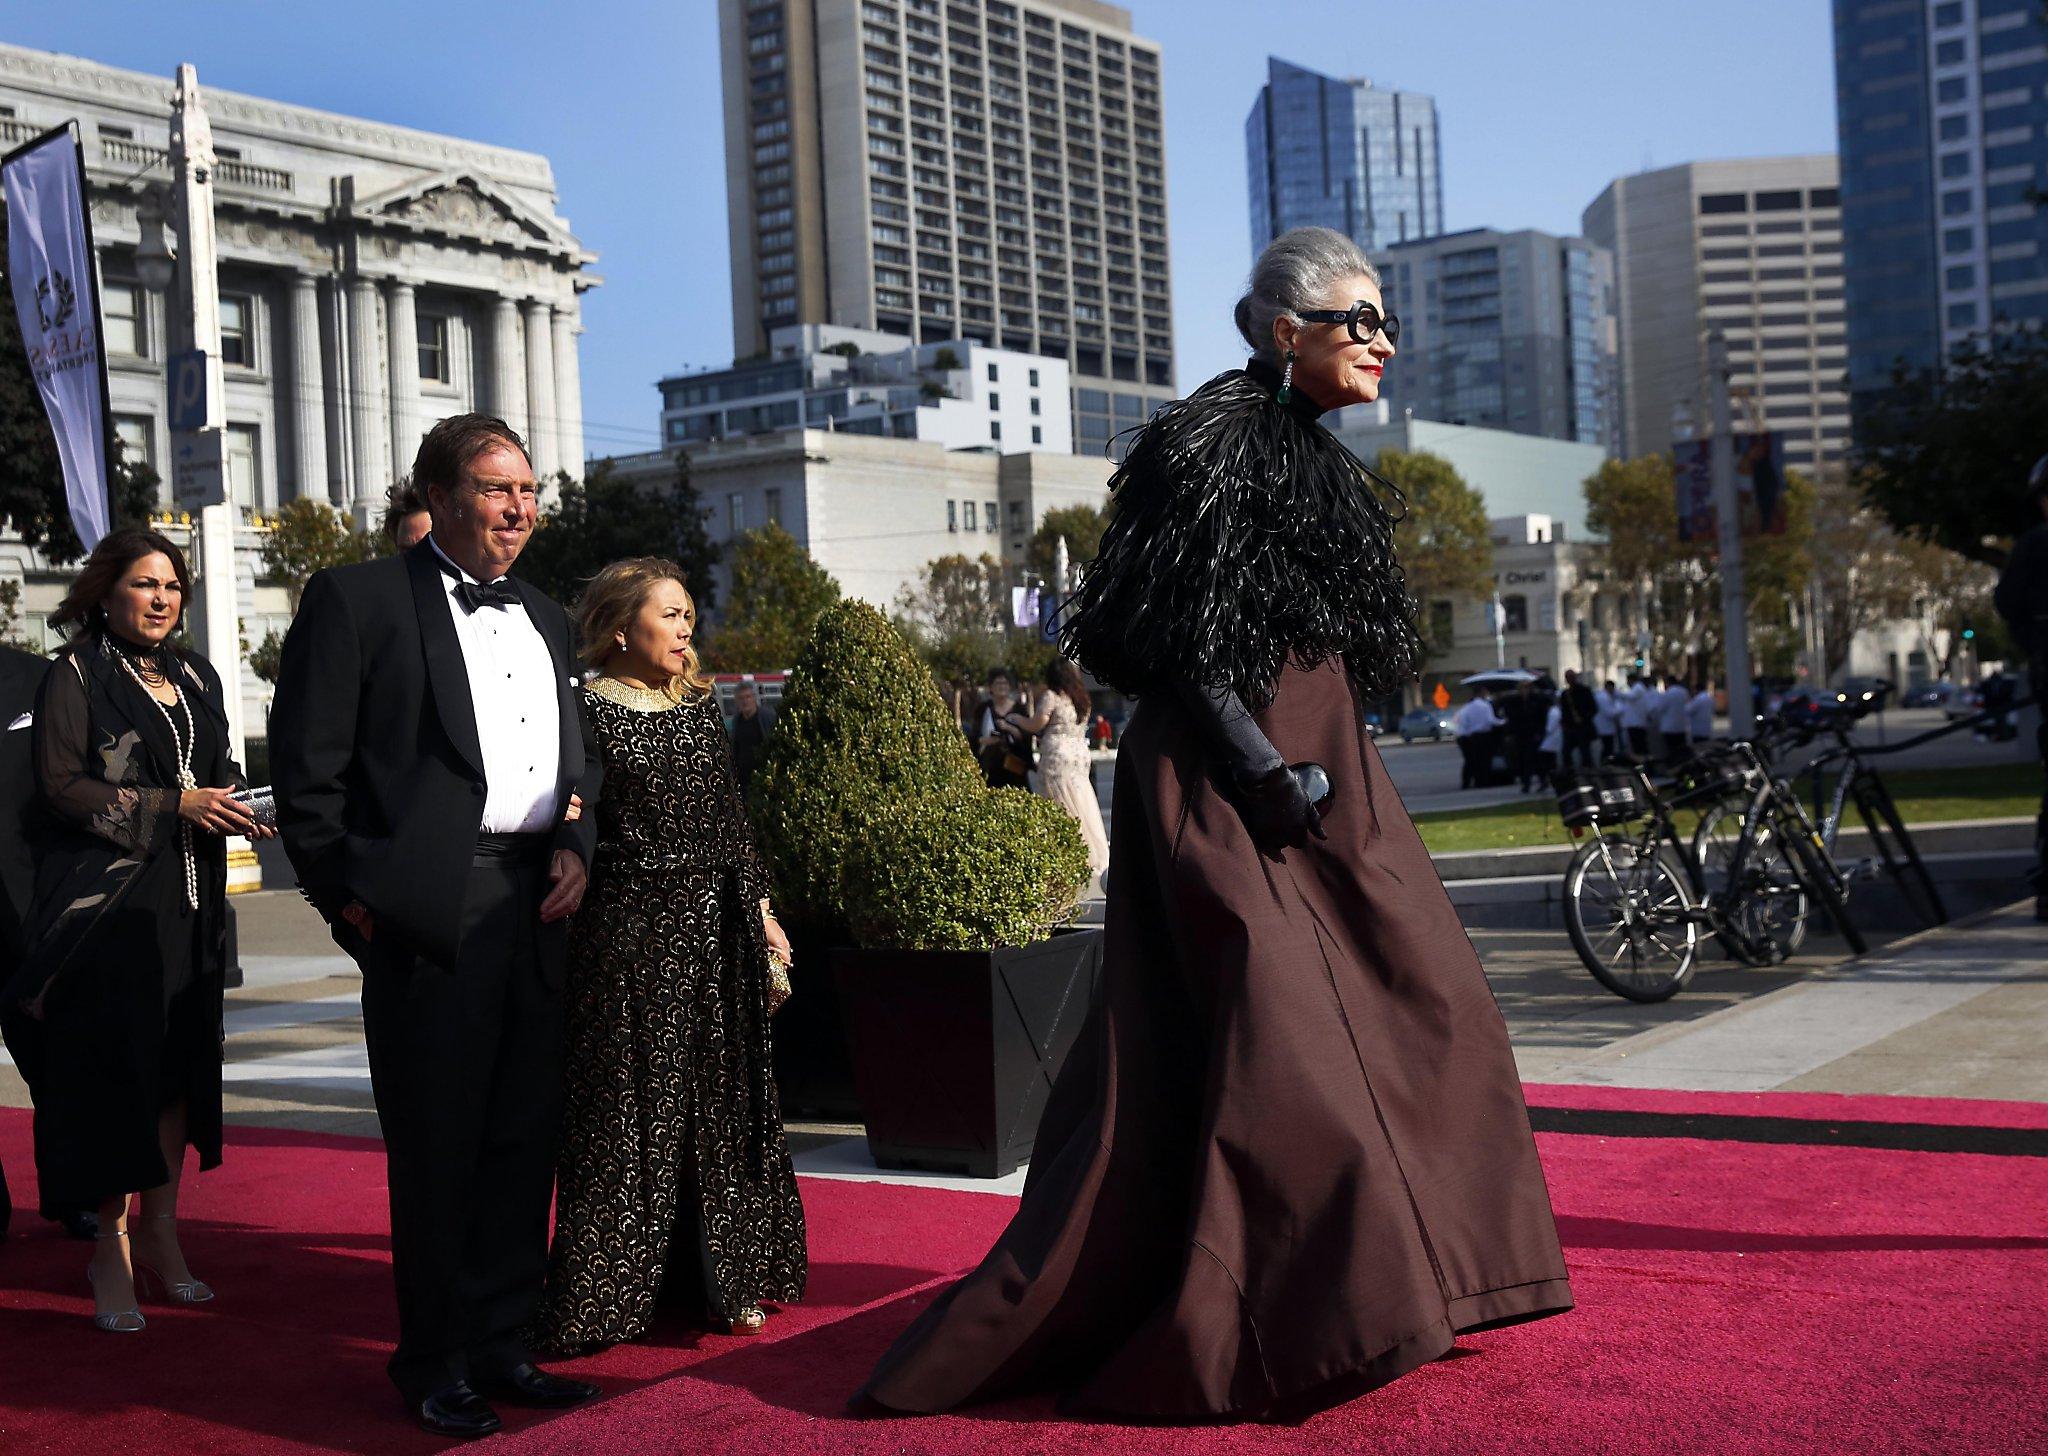 A Fashionable San Francisco Charity S Ugly Reality Sfchronicle Com